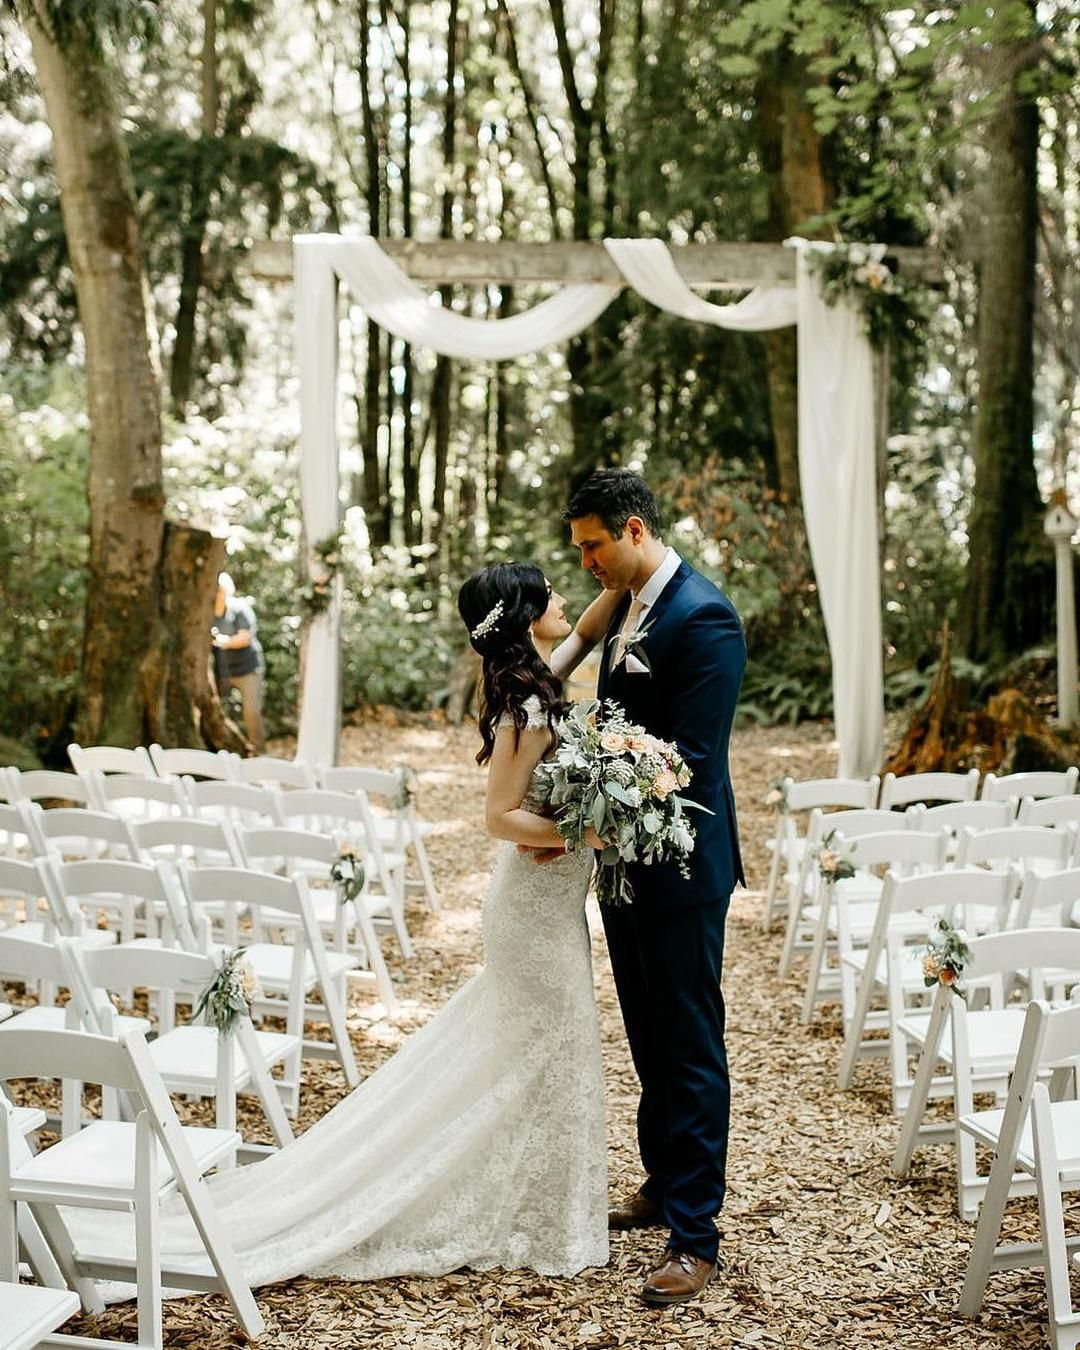 20 Seriously Stunning Washington Wedding Venues You'll ...